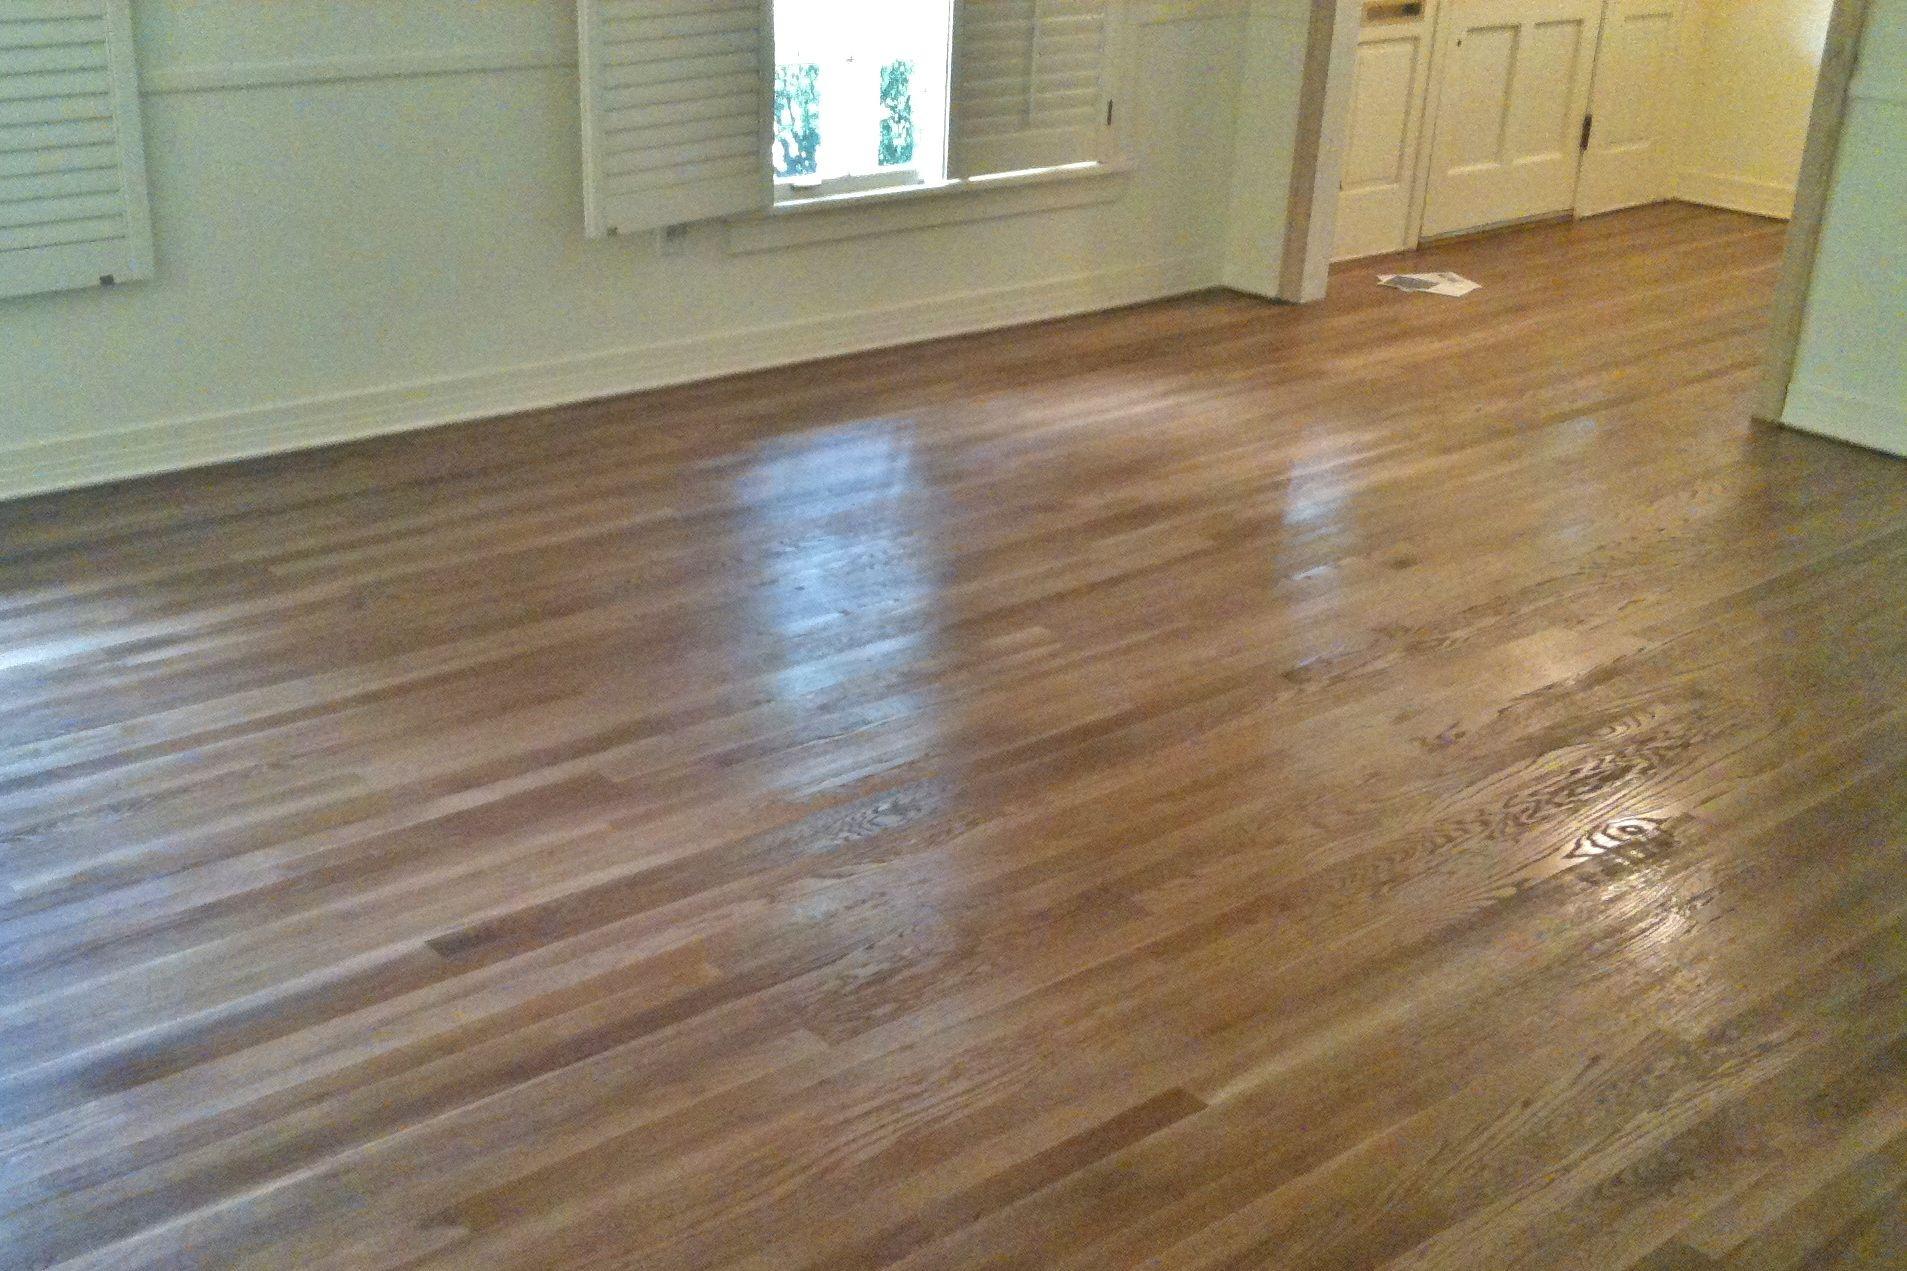 hardwood flooring usa of oak meet special walnut home design pinterest flooring intended for minwax special walnut stain on oak hardwood floors